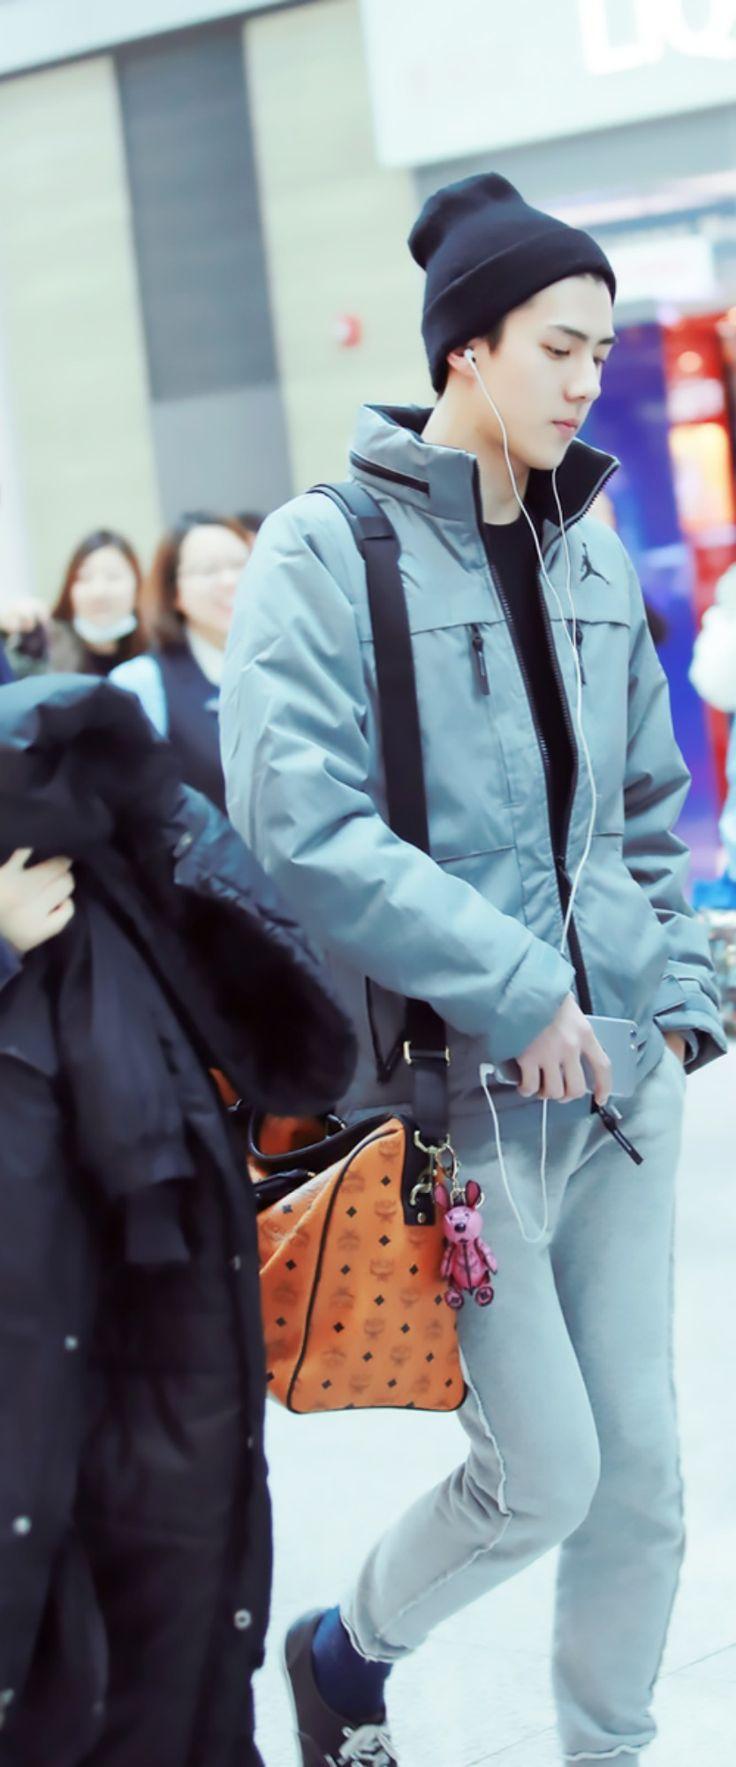 sehun luhan had a similar keychain on his bag too aww hunhan  ufe0f